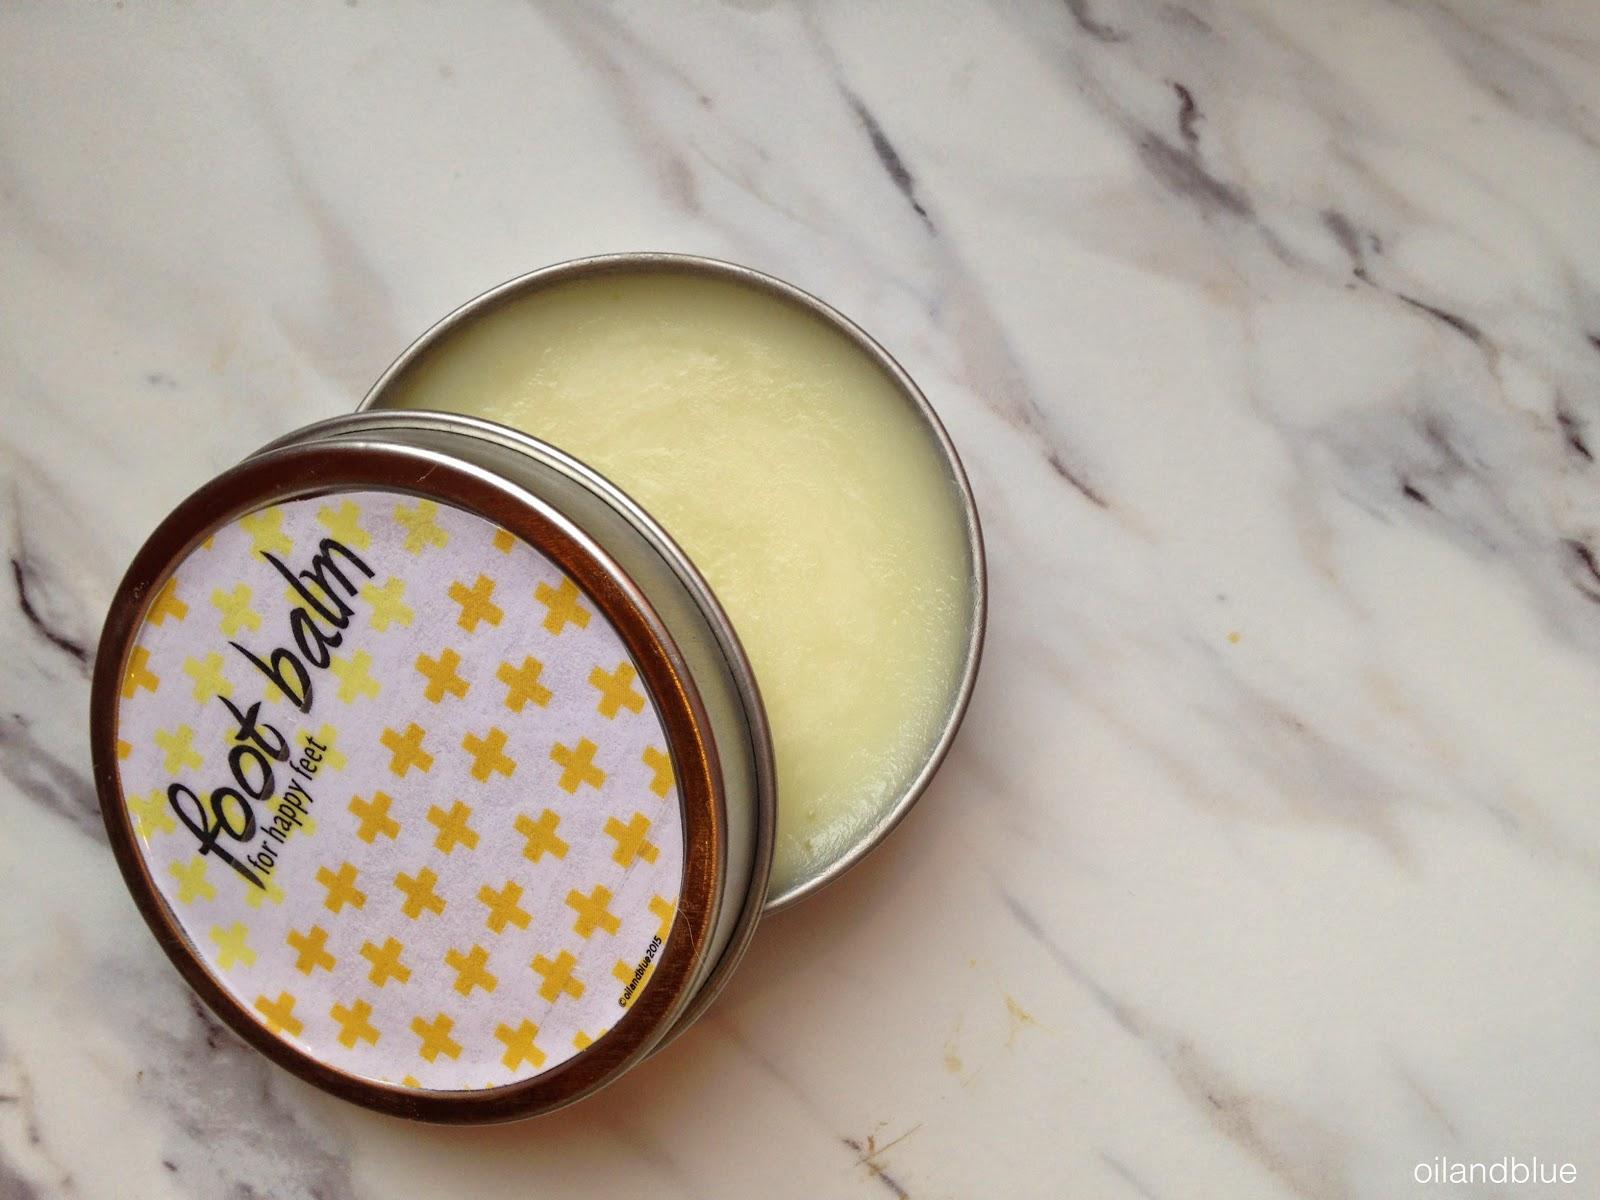 http://oilandblue.blogspot.com/2015/05/how-to-make-super-moisturizing-foot-balm.html